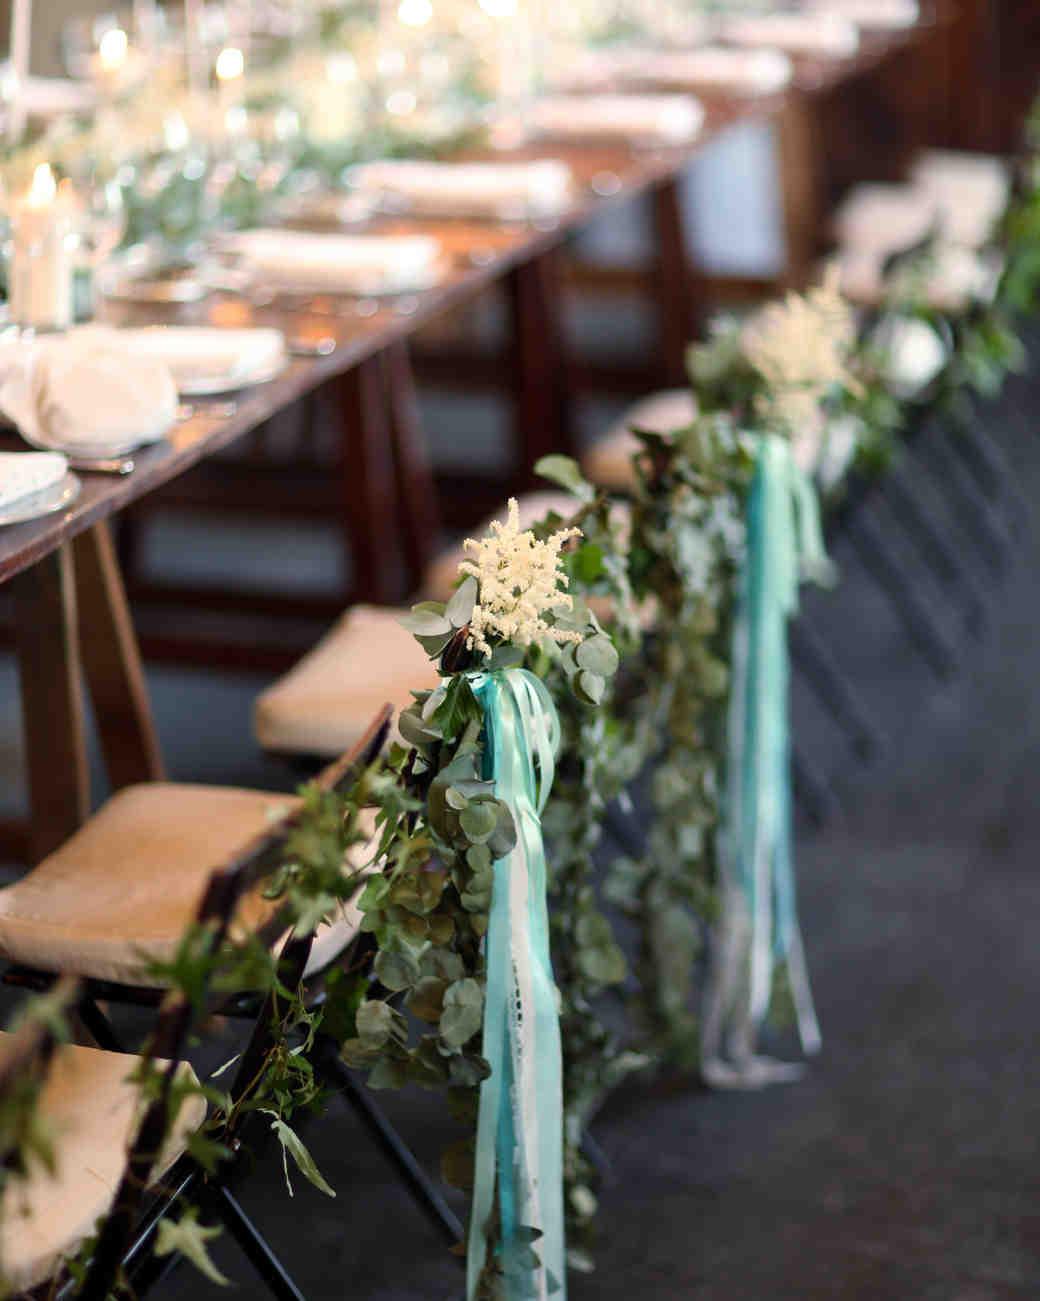 lindsay-andy-wedding-chairbacks-8213-s111659-1114.jpg